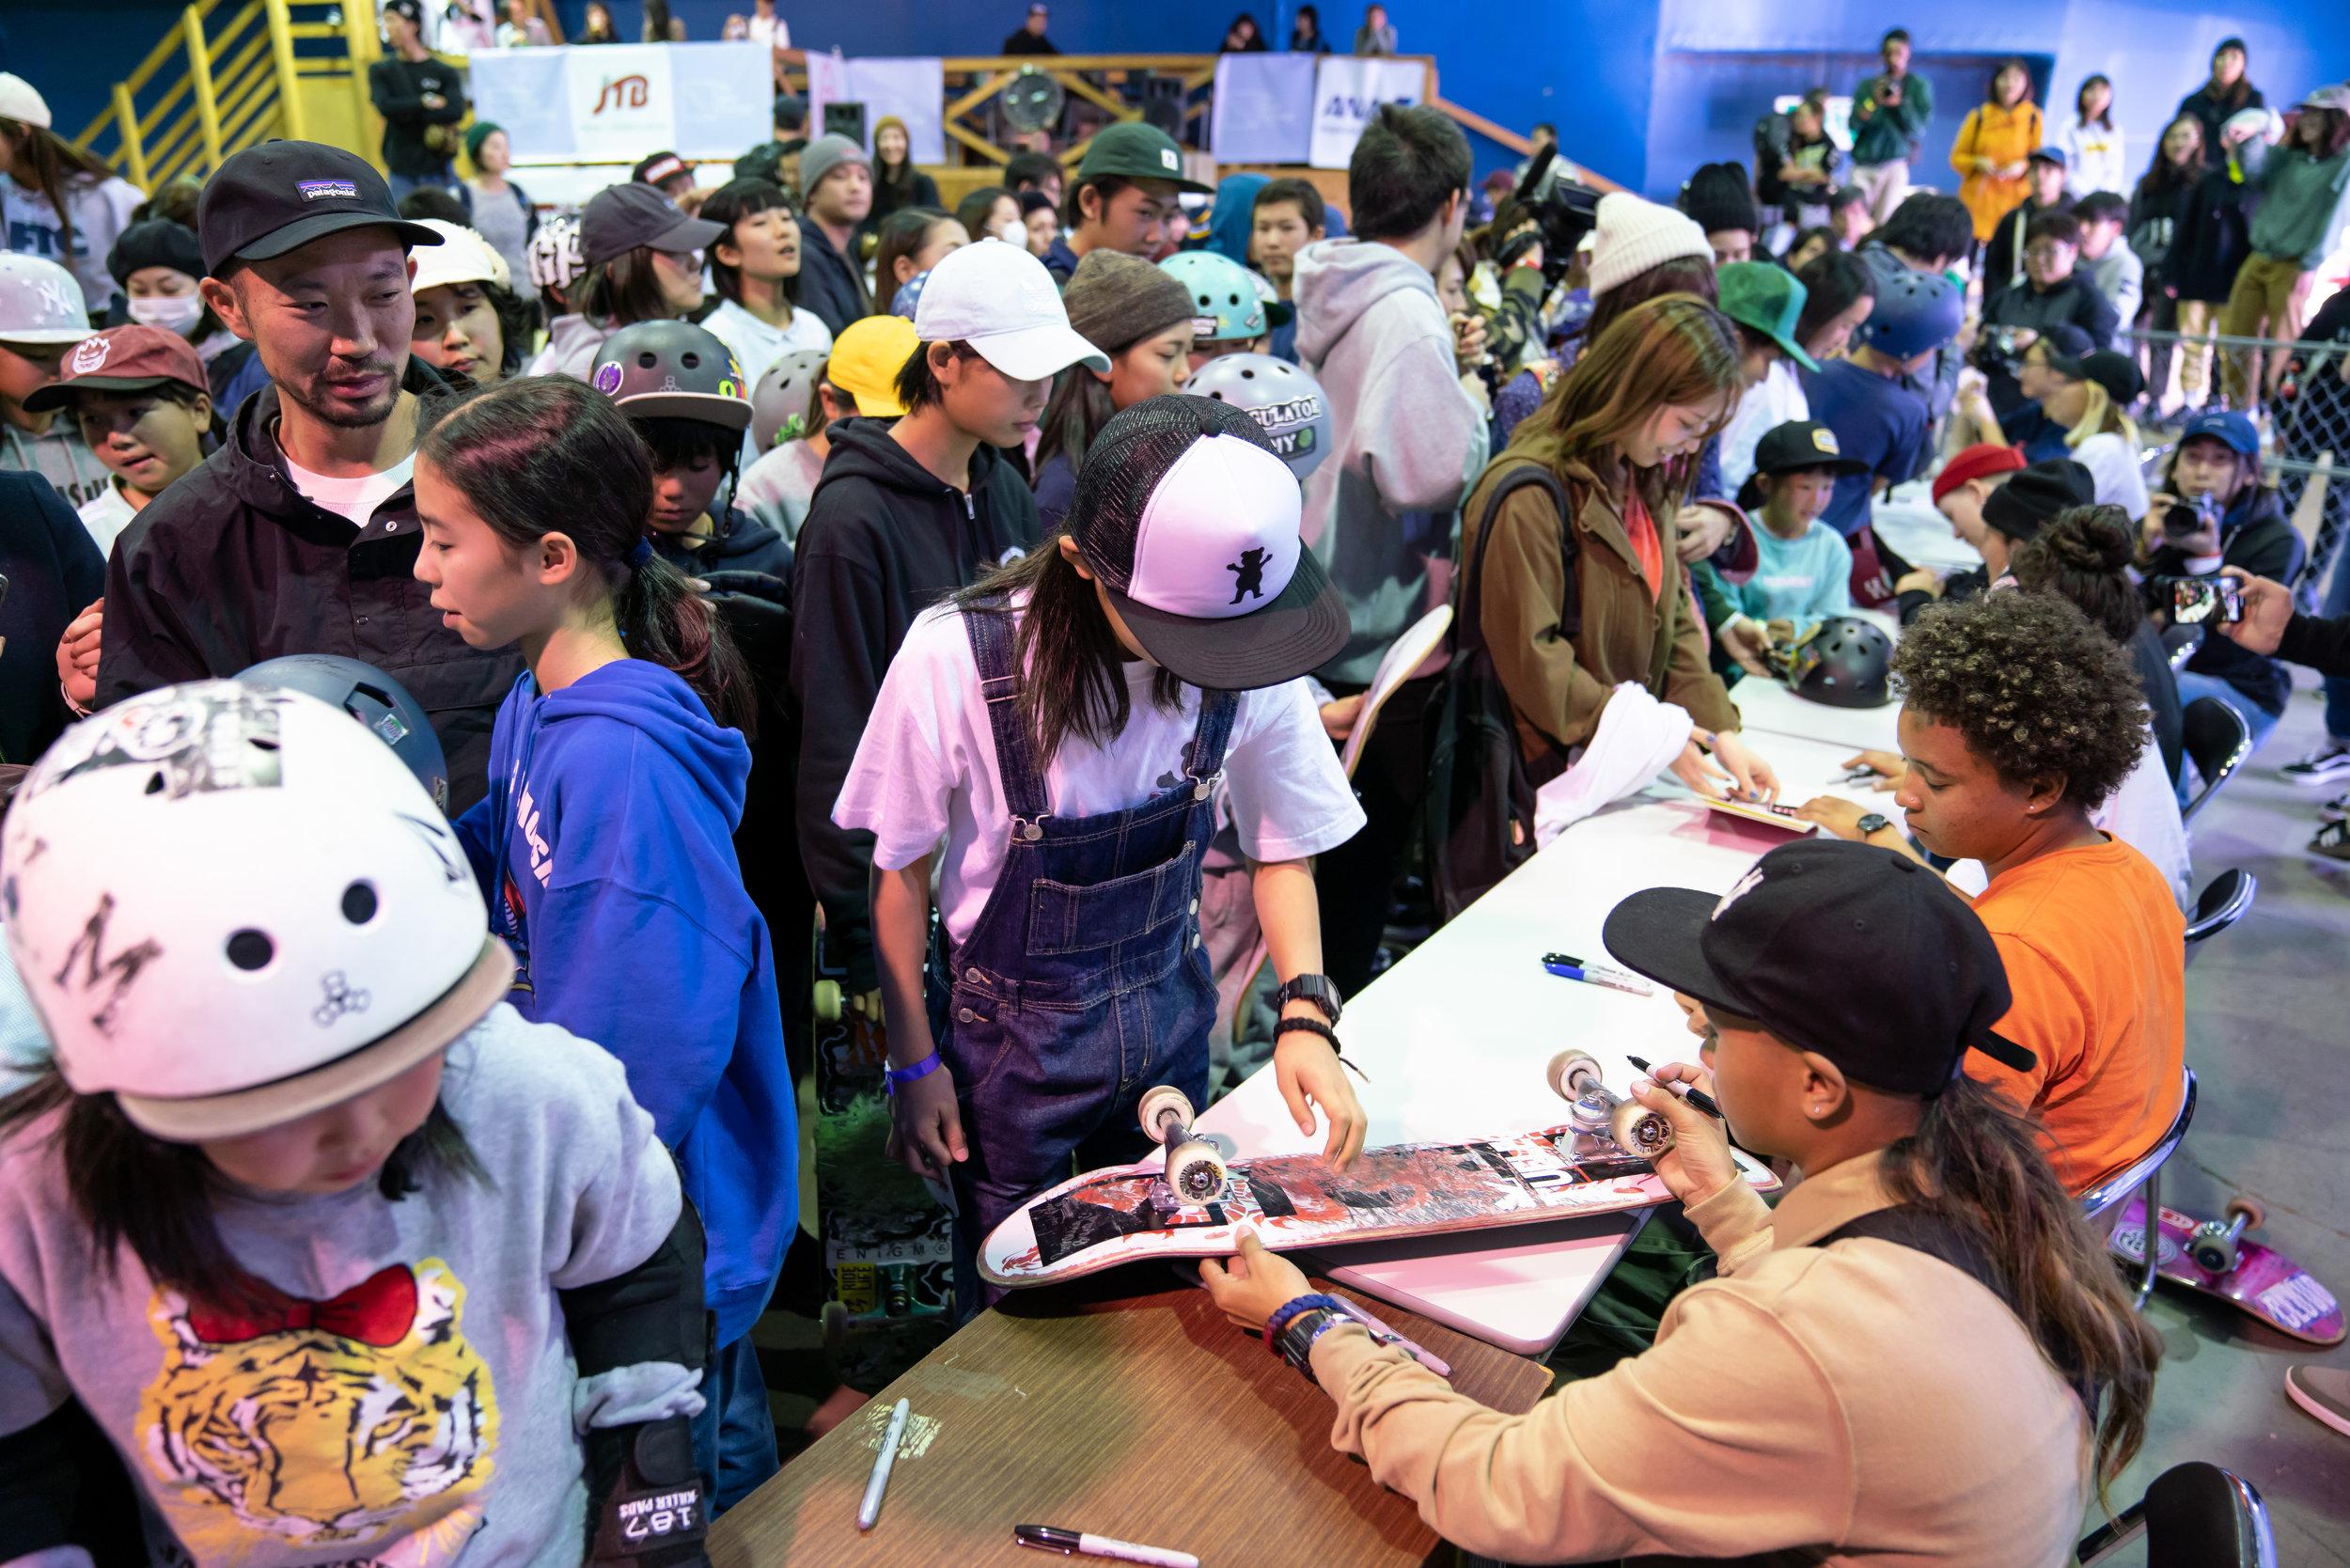 Skate Exchange3_Event Day Japan 2018_hannah bailey00007.jpg